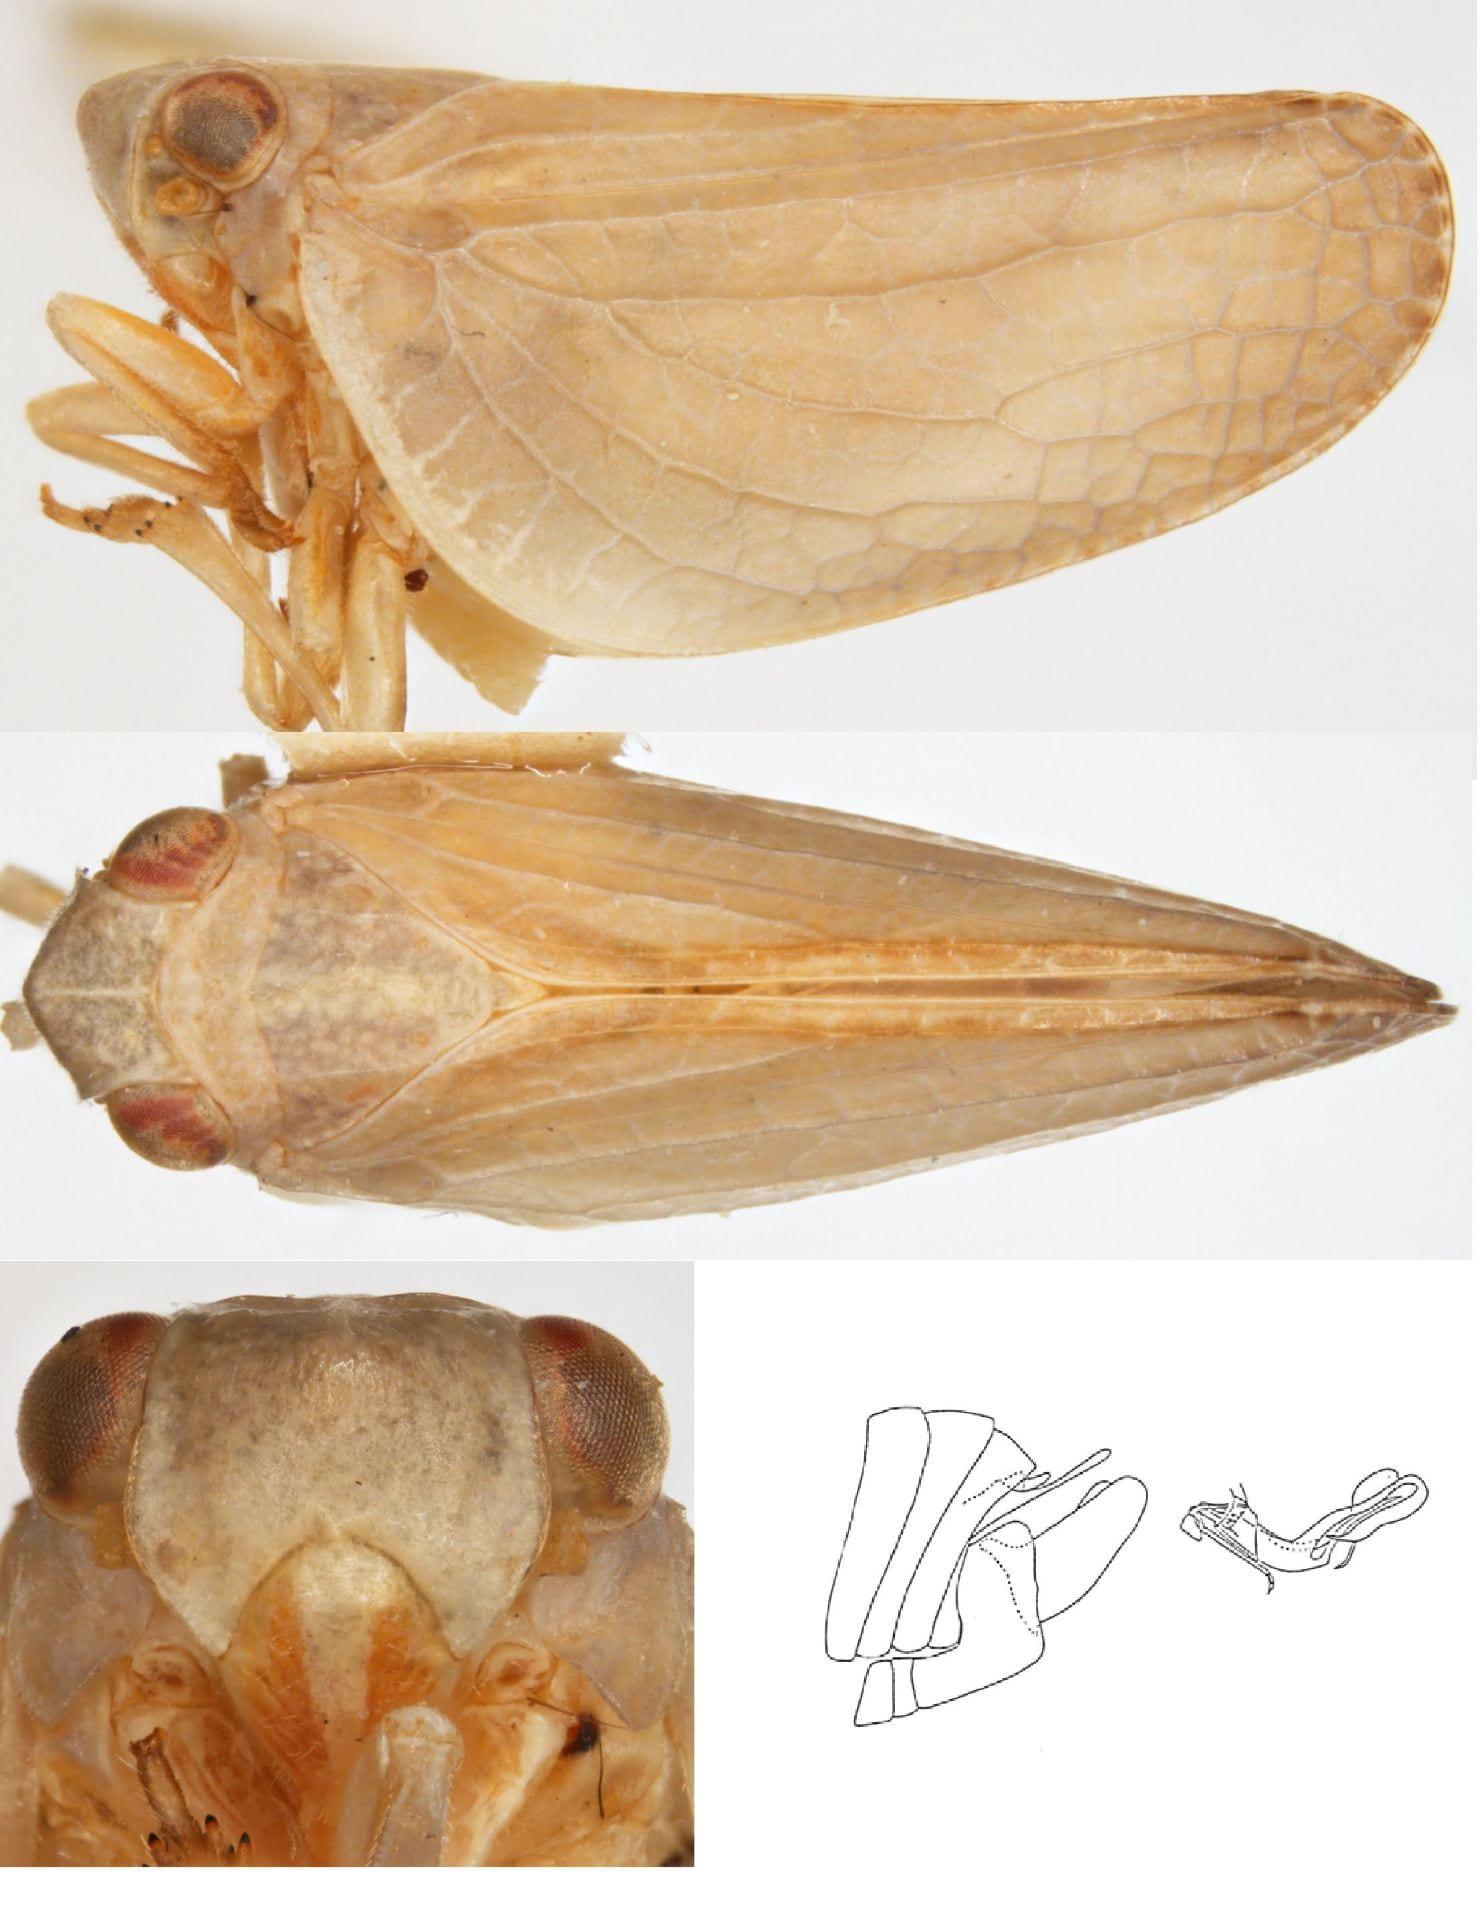 Acanalonia mollicula